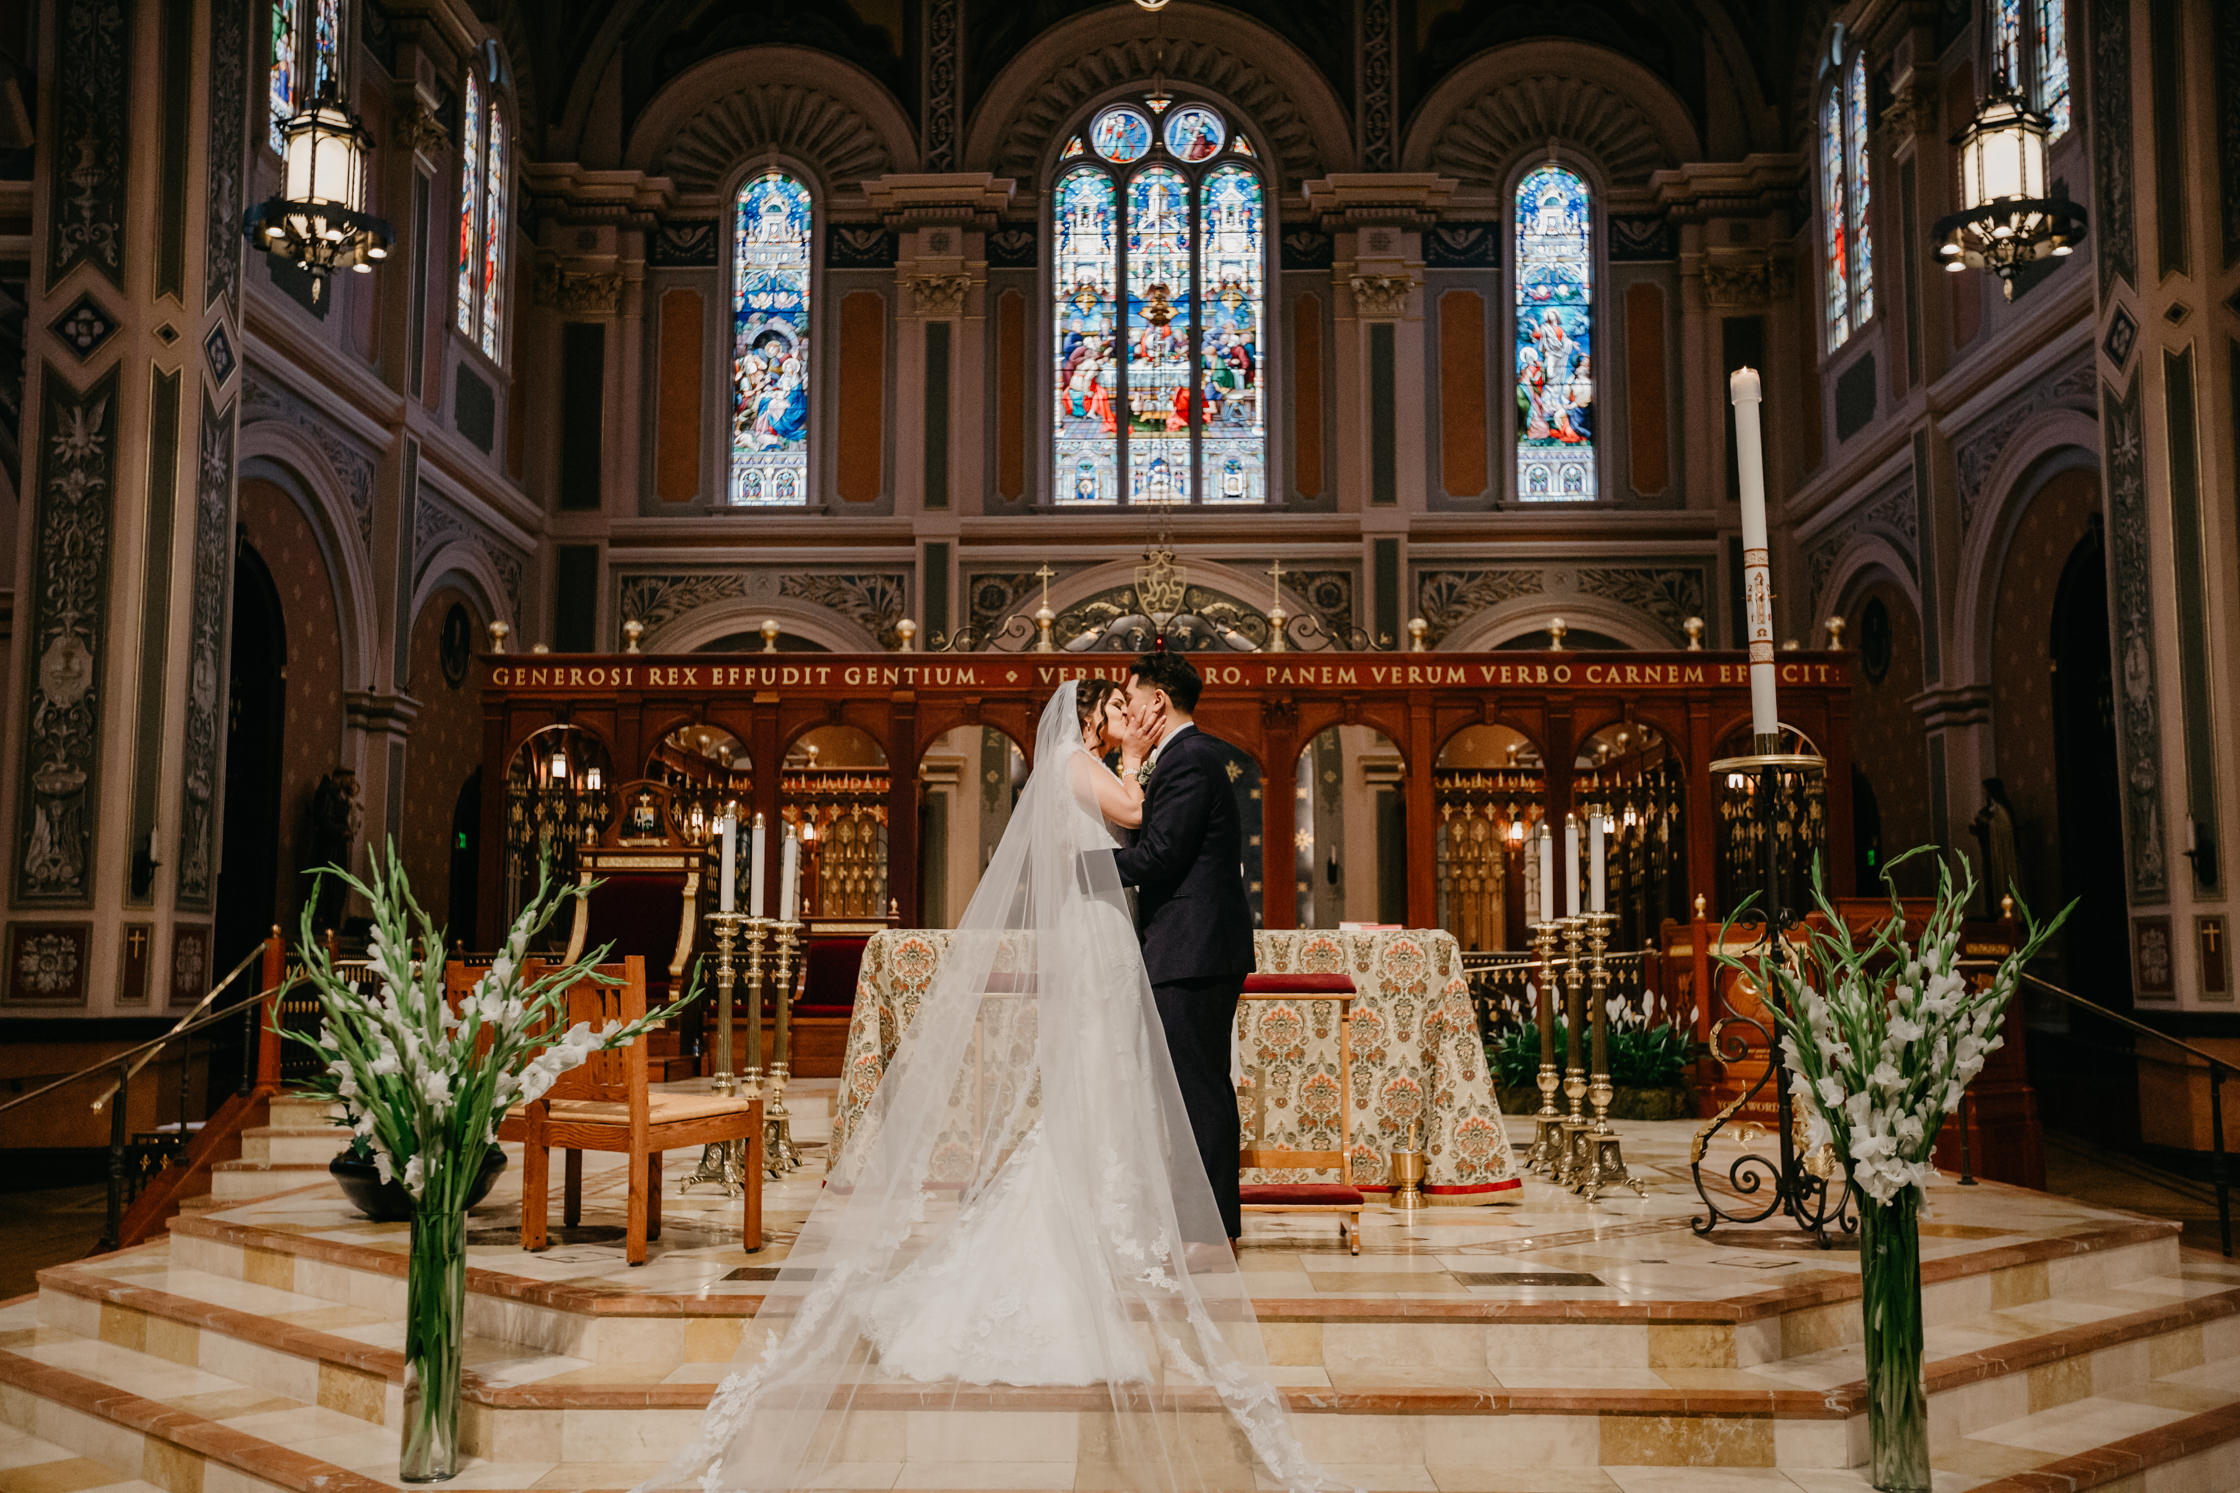 luis_joanna_wedding-41.jpg